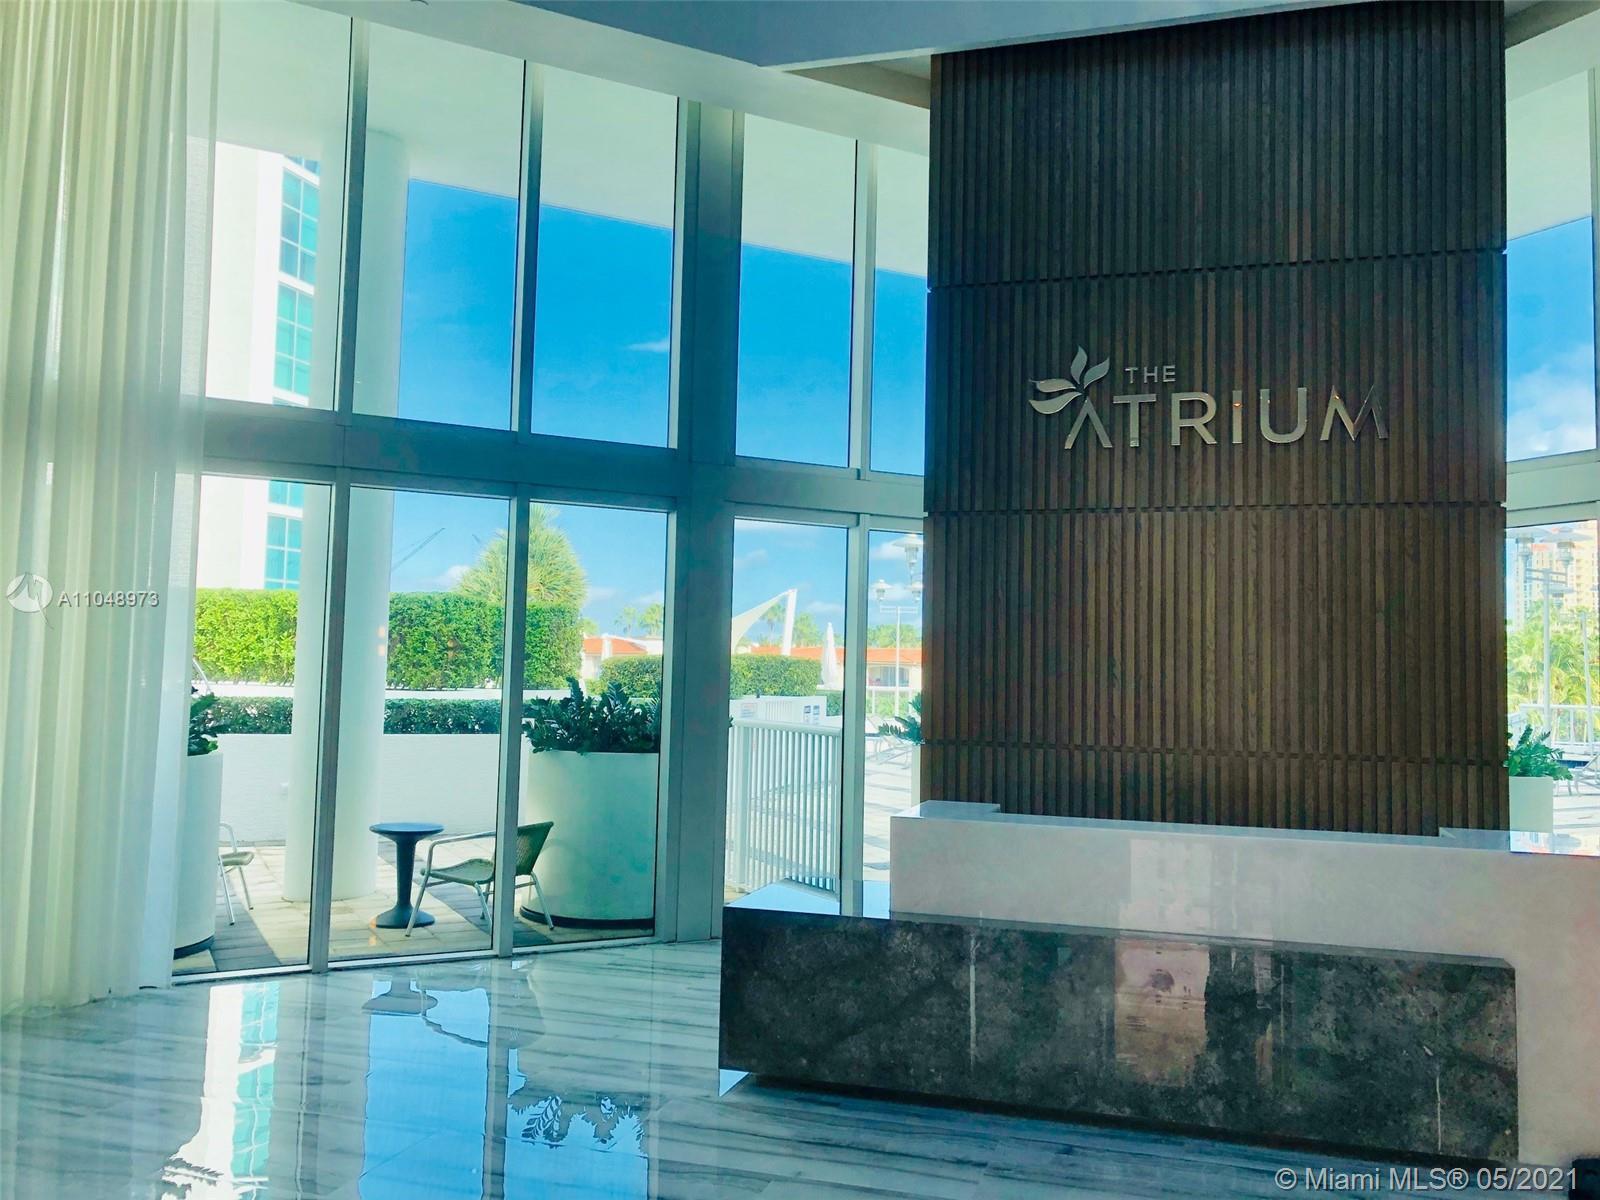 Atrium Condos for sale - Aventura Luxury Waterfront Condos